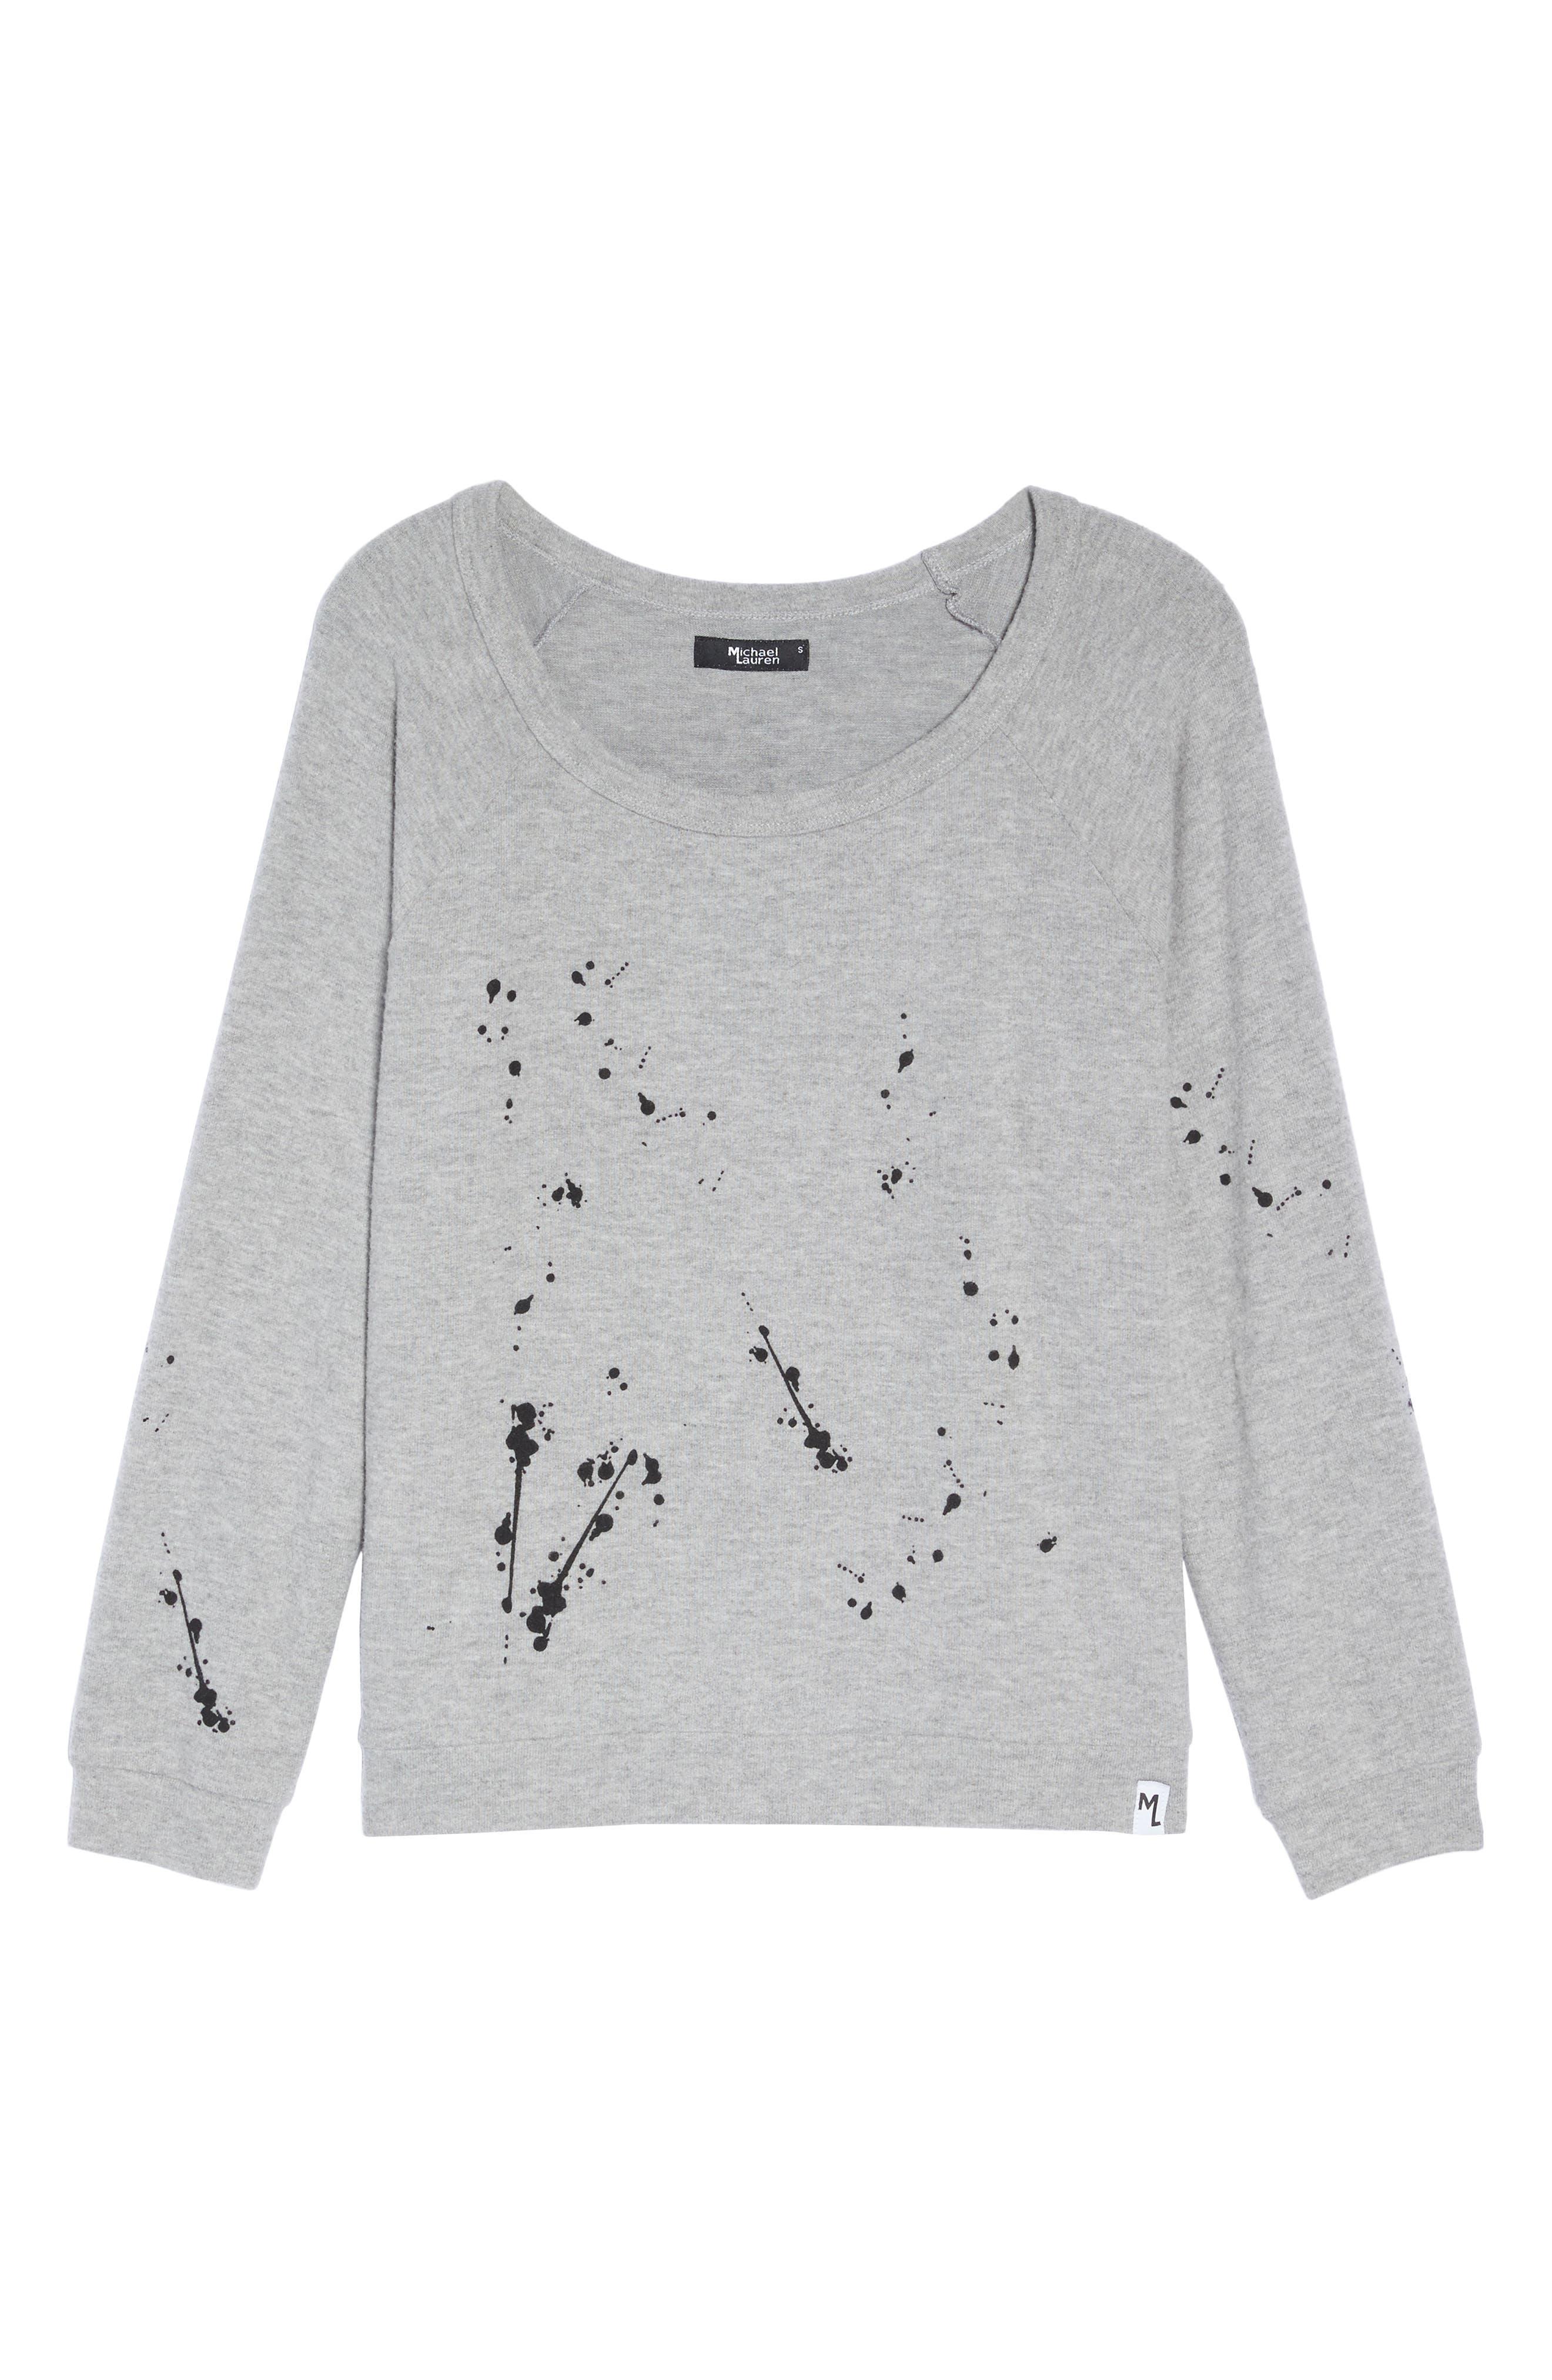 Kenny Splatter Lounge Sweatshirt,                             Alternate thumbnail 4, color,                             Heather Grey